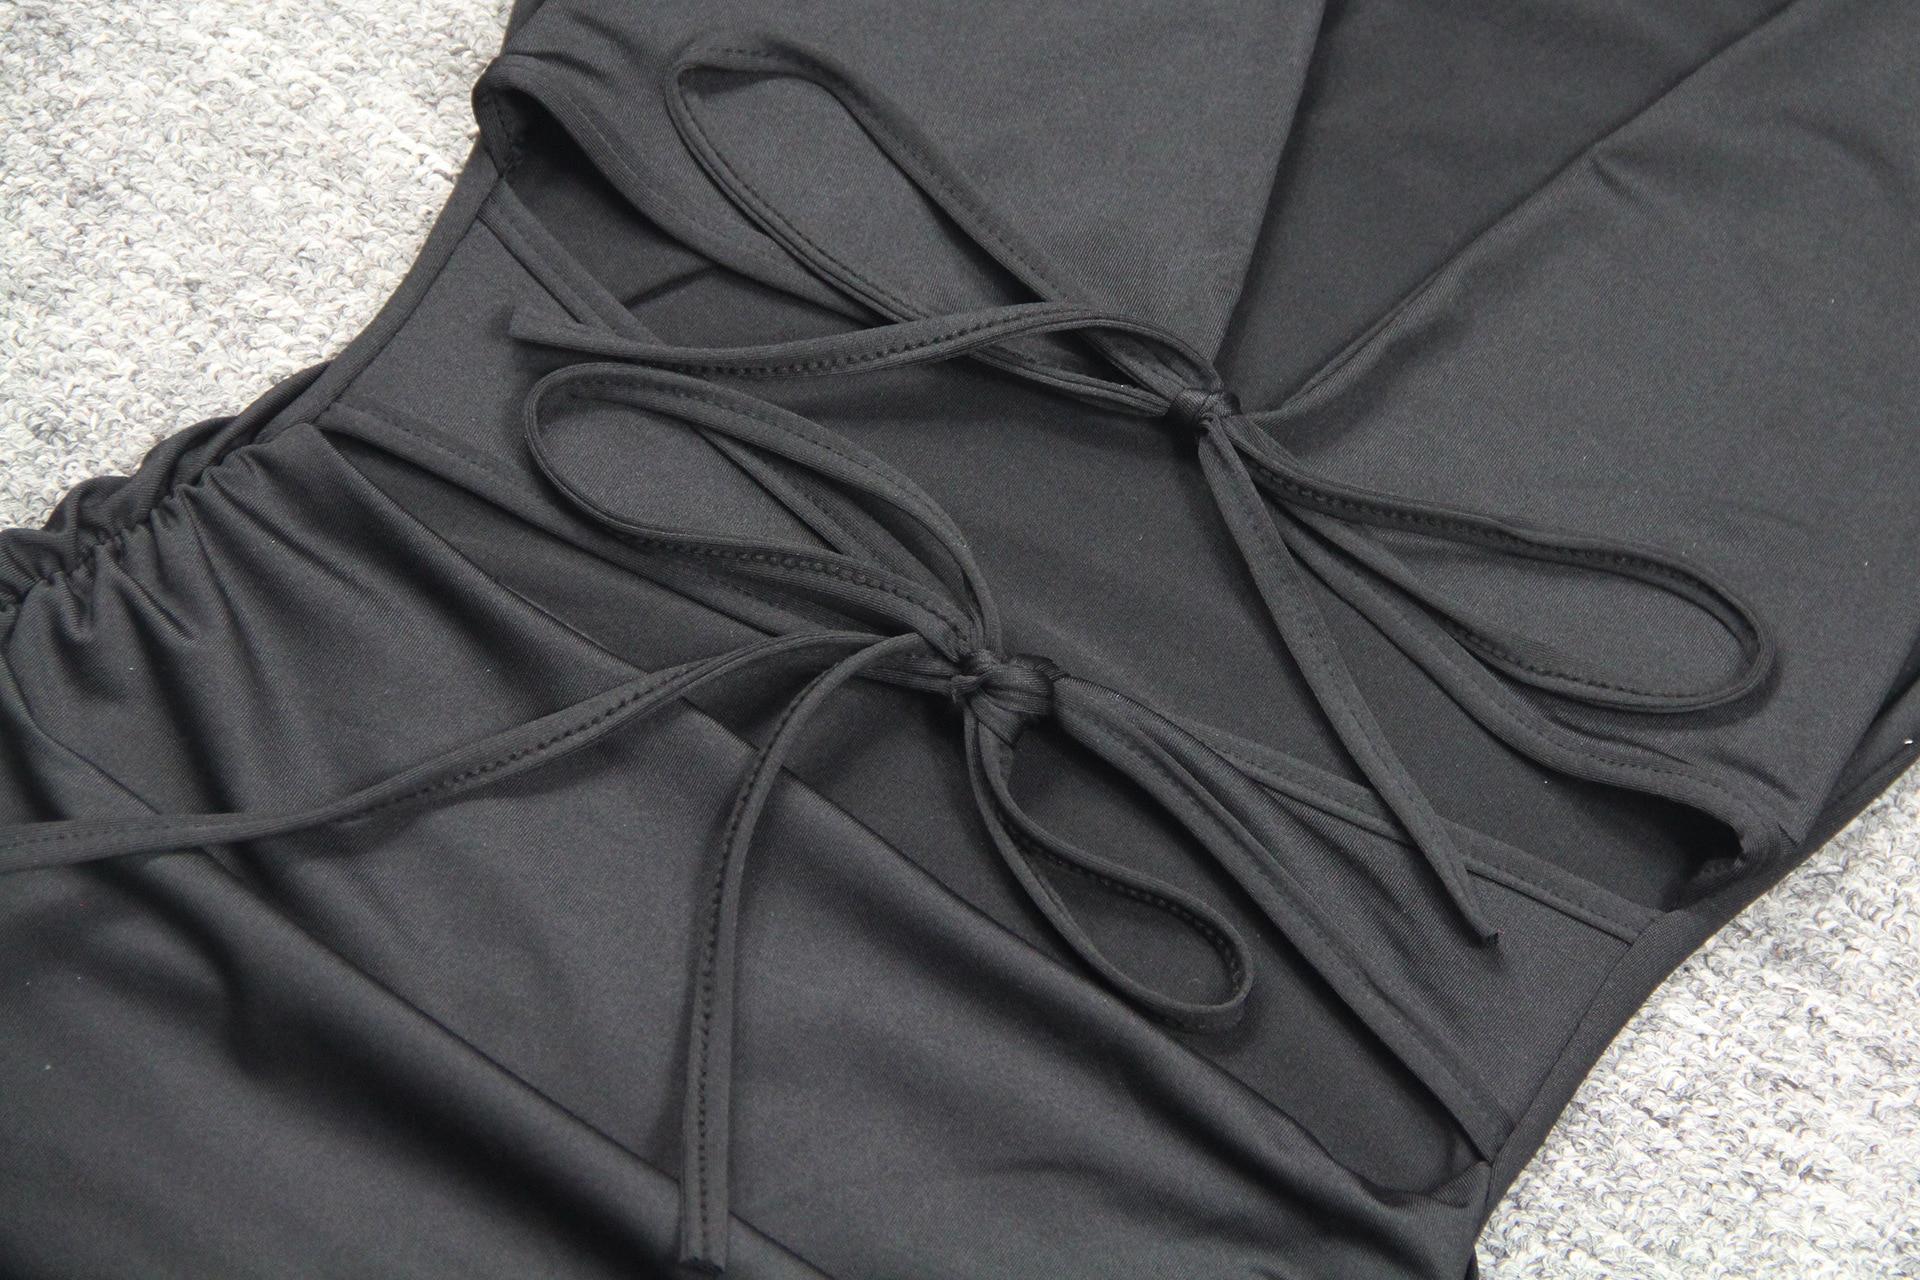 Women Summer Ruffles Cut Out Design Leopard Print Dress Elegant Fashion V-neck Ruffle Party Mini Dress Ladies Holiday Beach